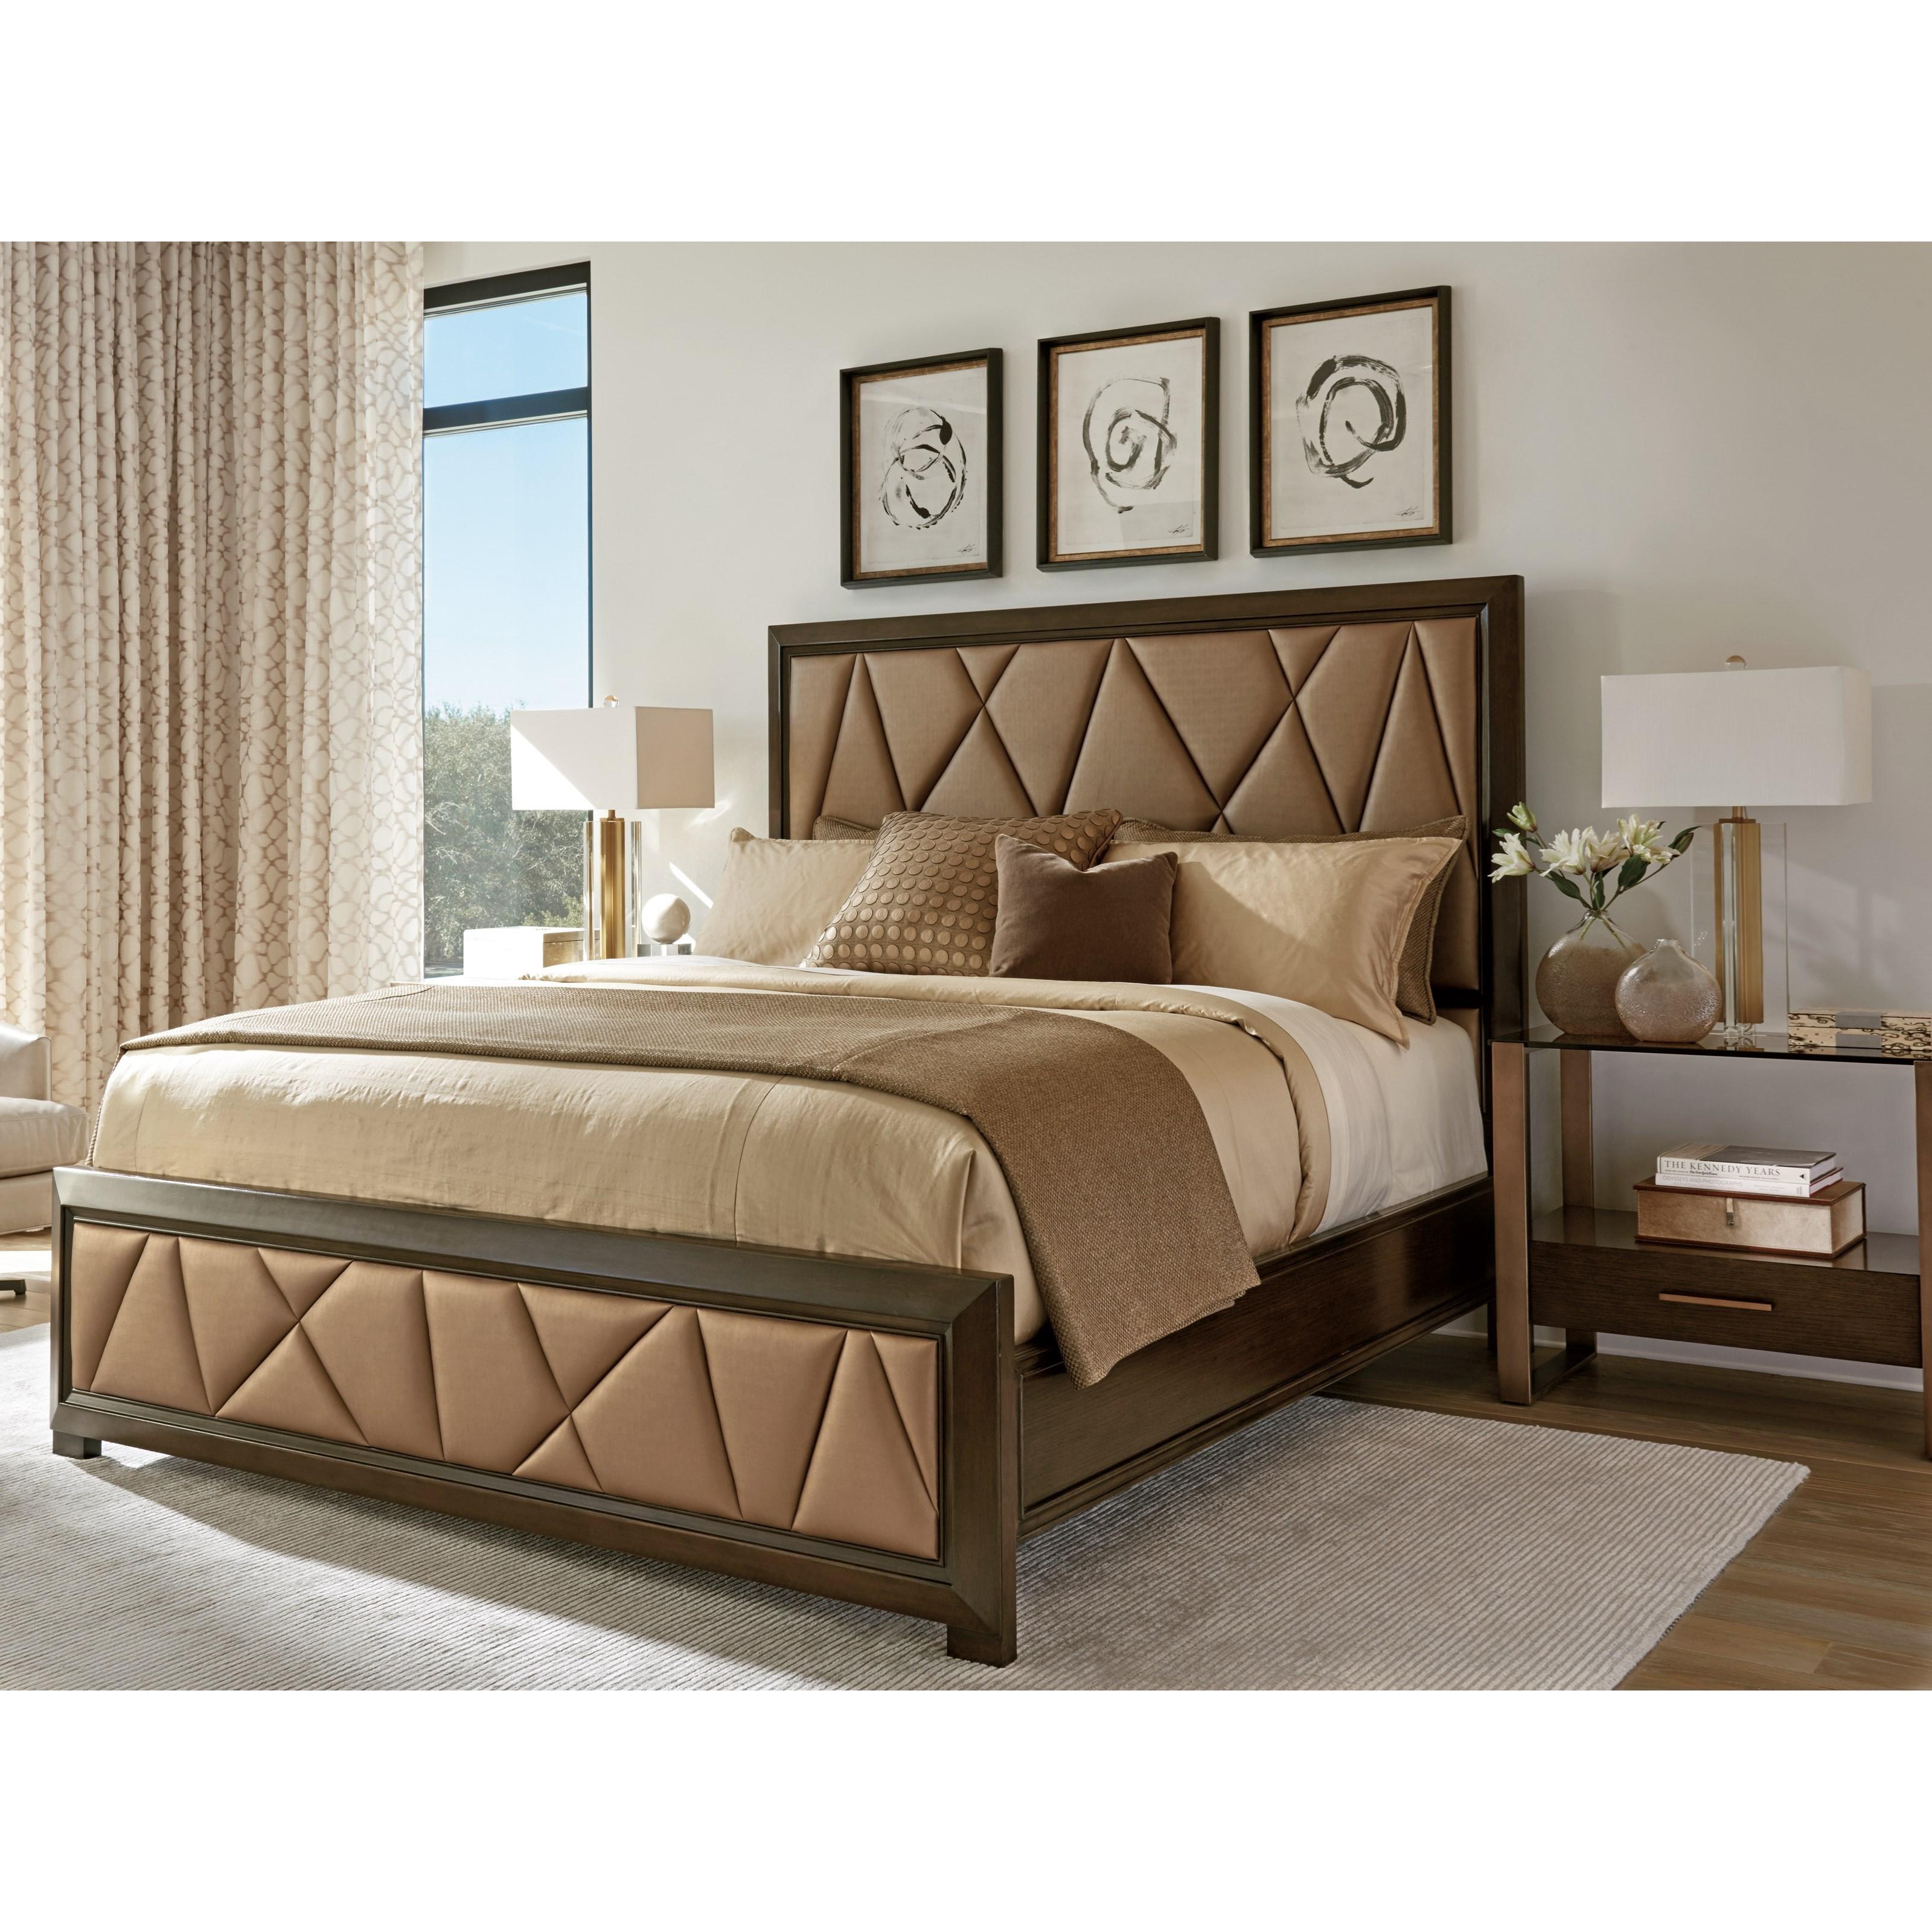 Lexington Zavala King Bedroom Group - Item Number: 790 K Bedroom Group 3